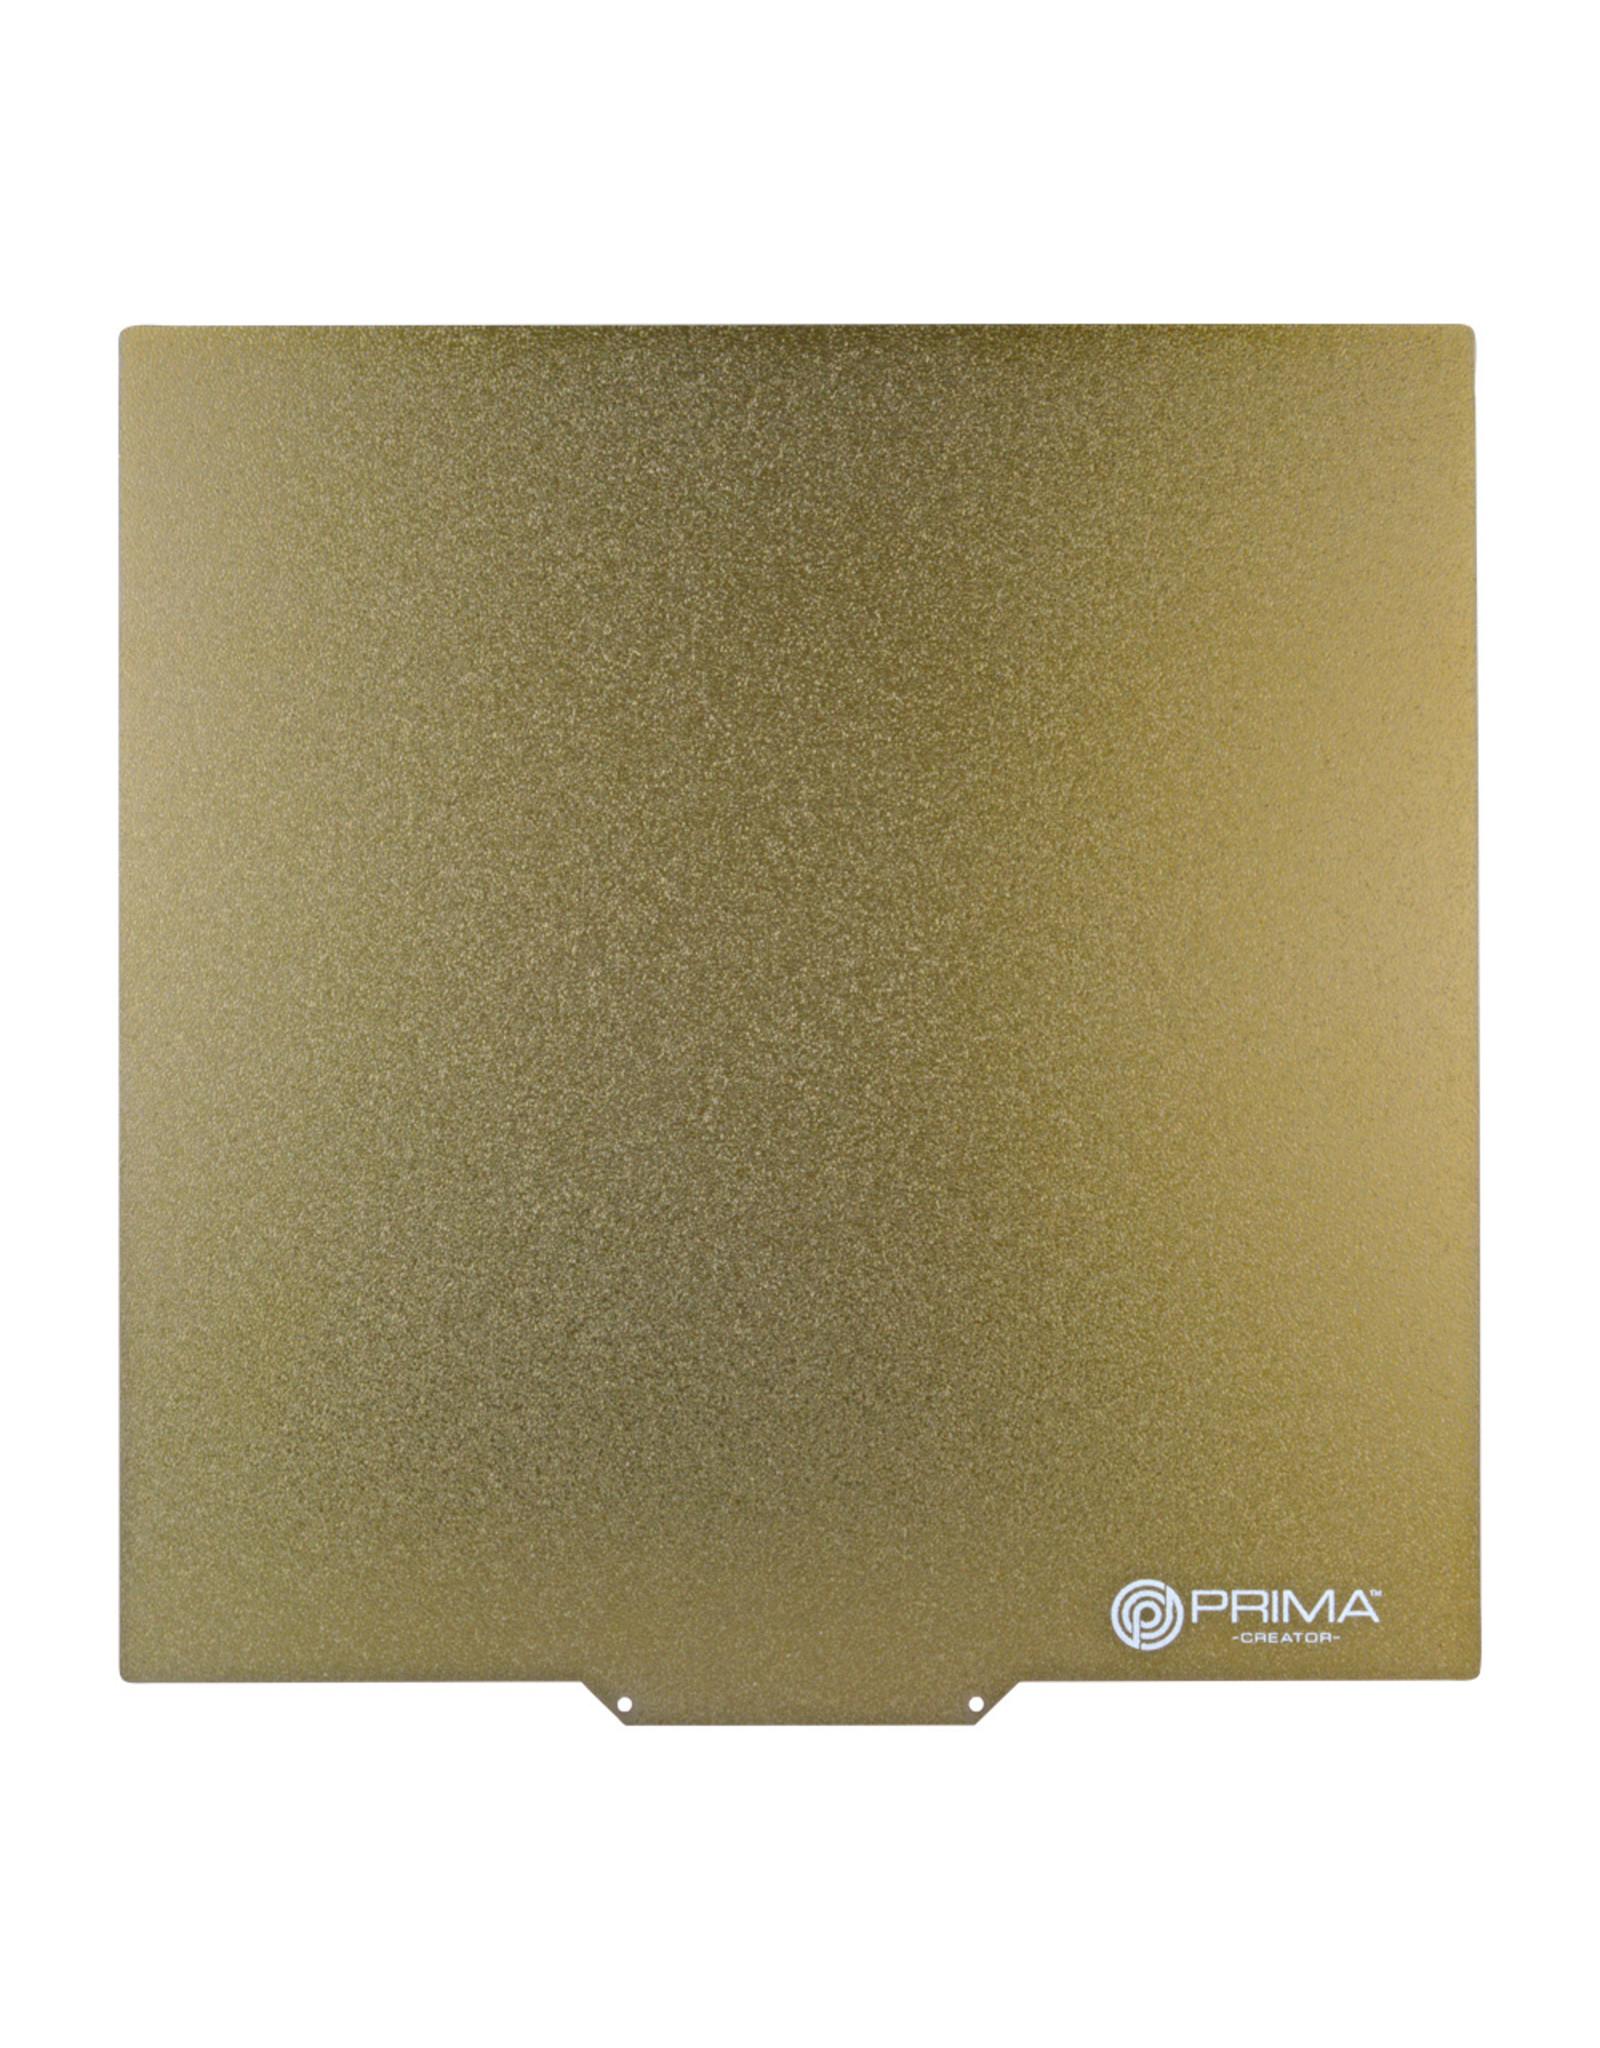 Prima PrimaCreator FlexPlate-Powder Coated PEI 220 x 220 mm